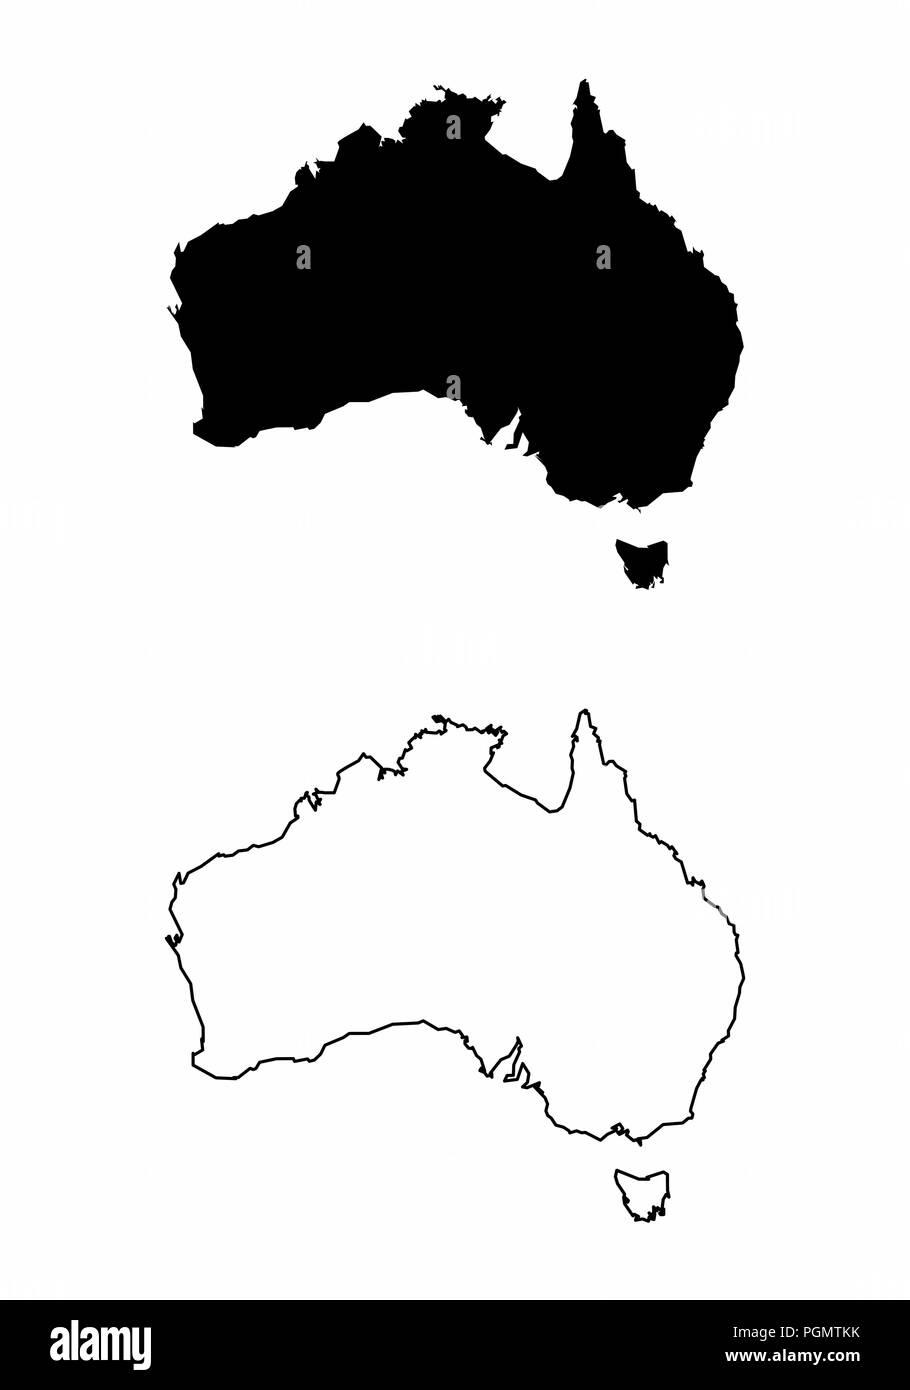 Maps of Australia - Stock Image